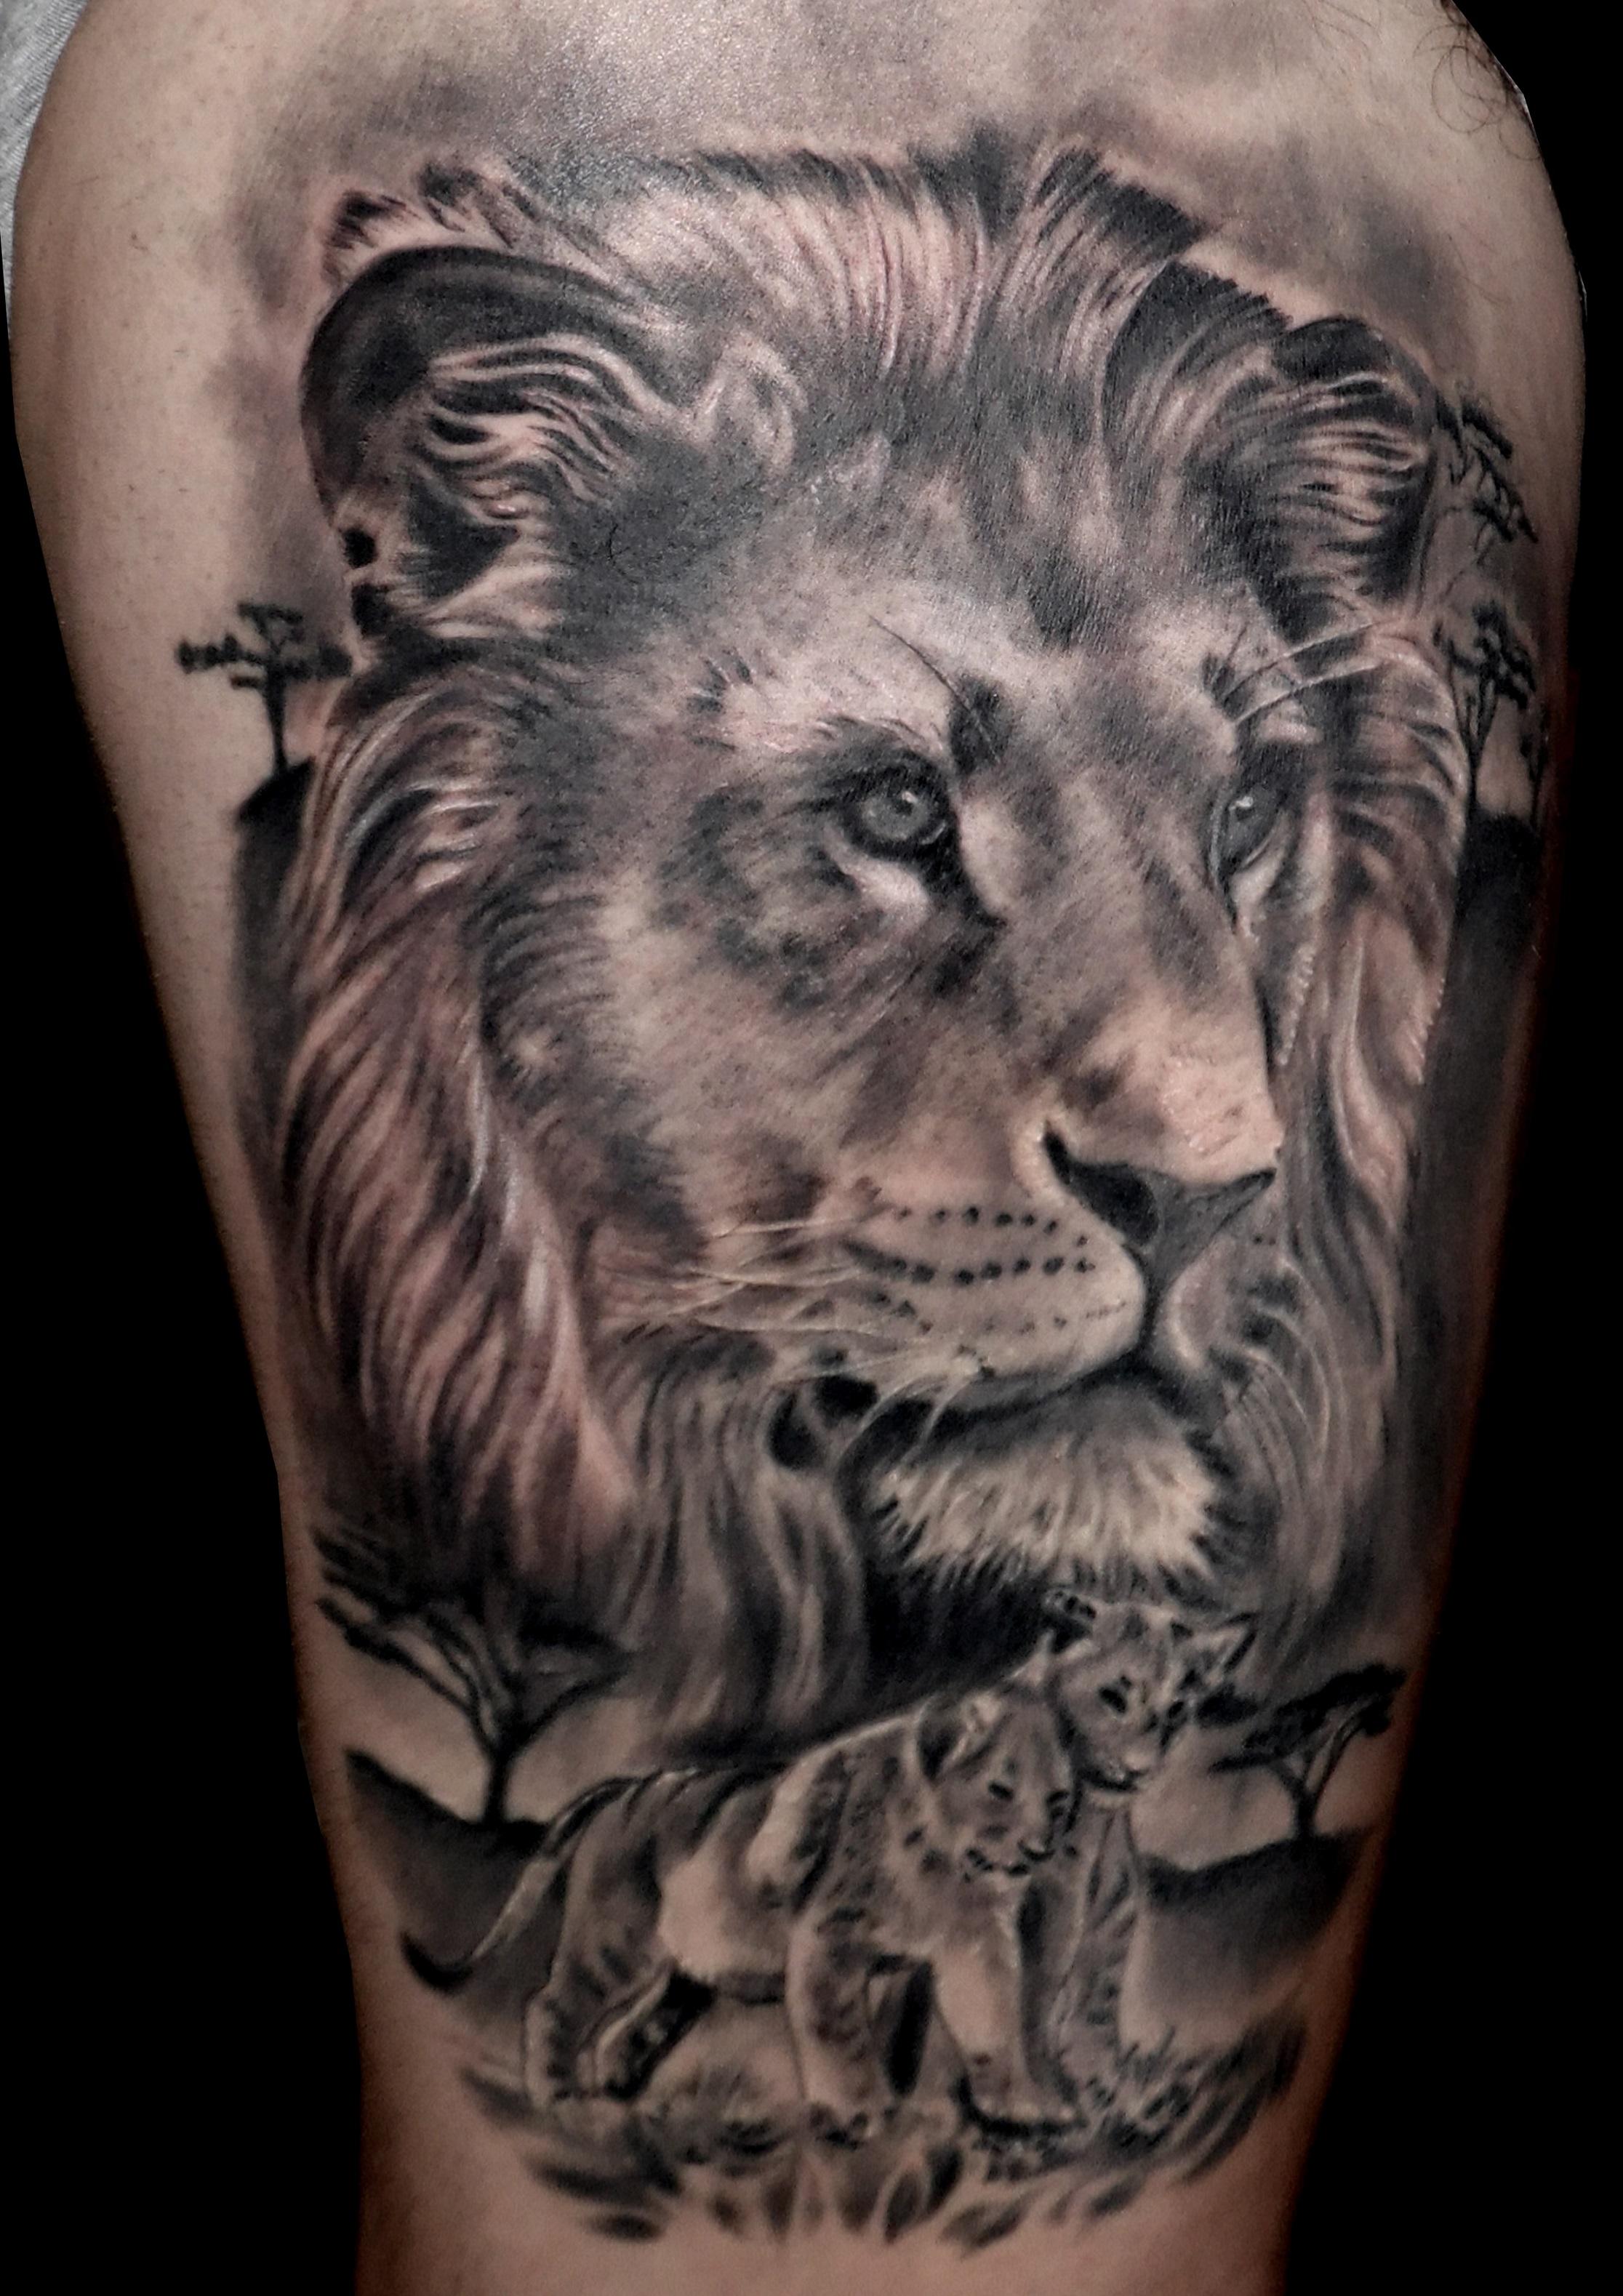 tatuaje tattoo leon familia realismo naturaleza animales muslo blanco negro 13depicas jaca huesca